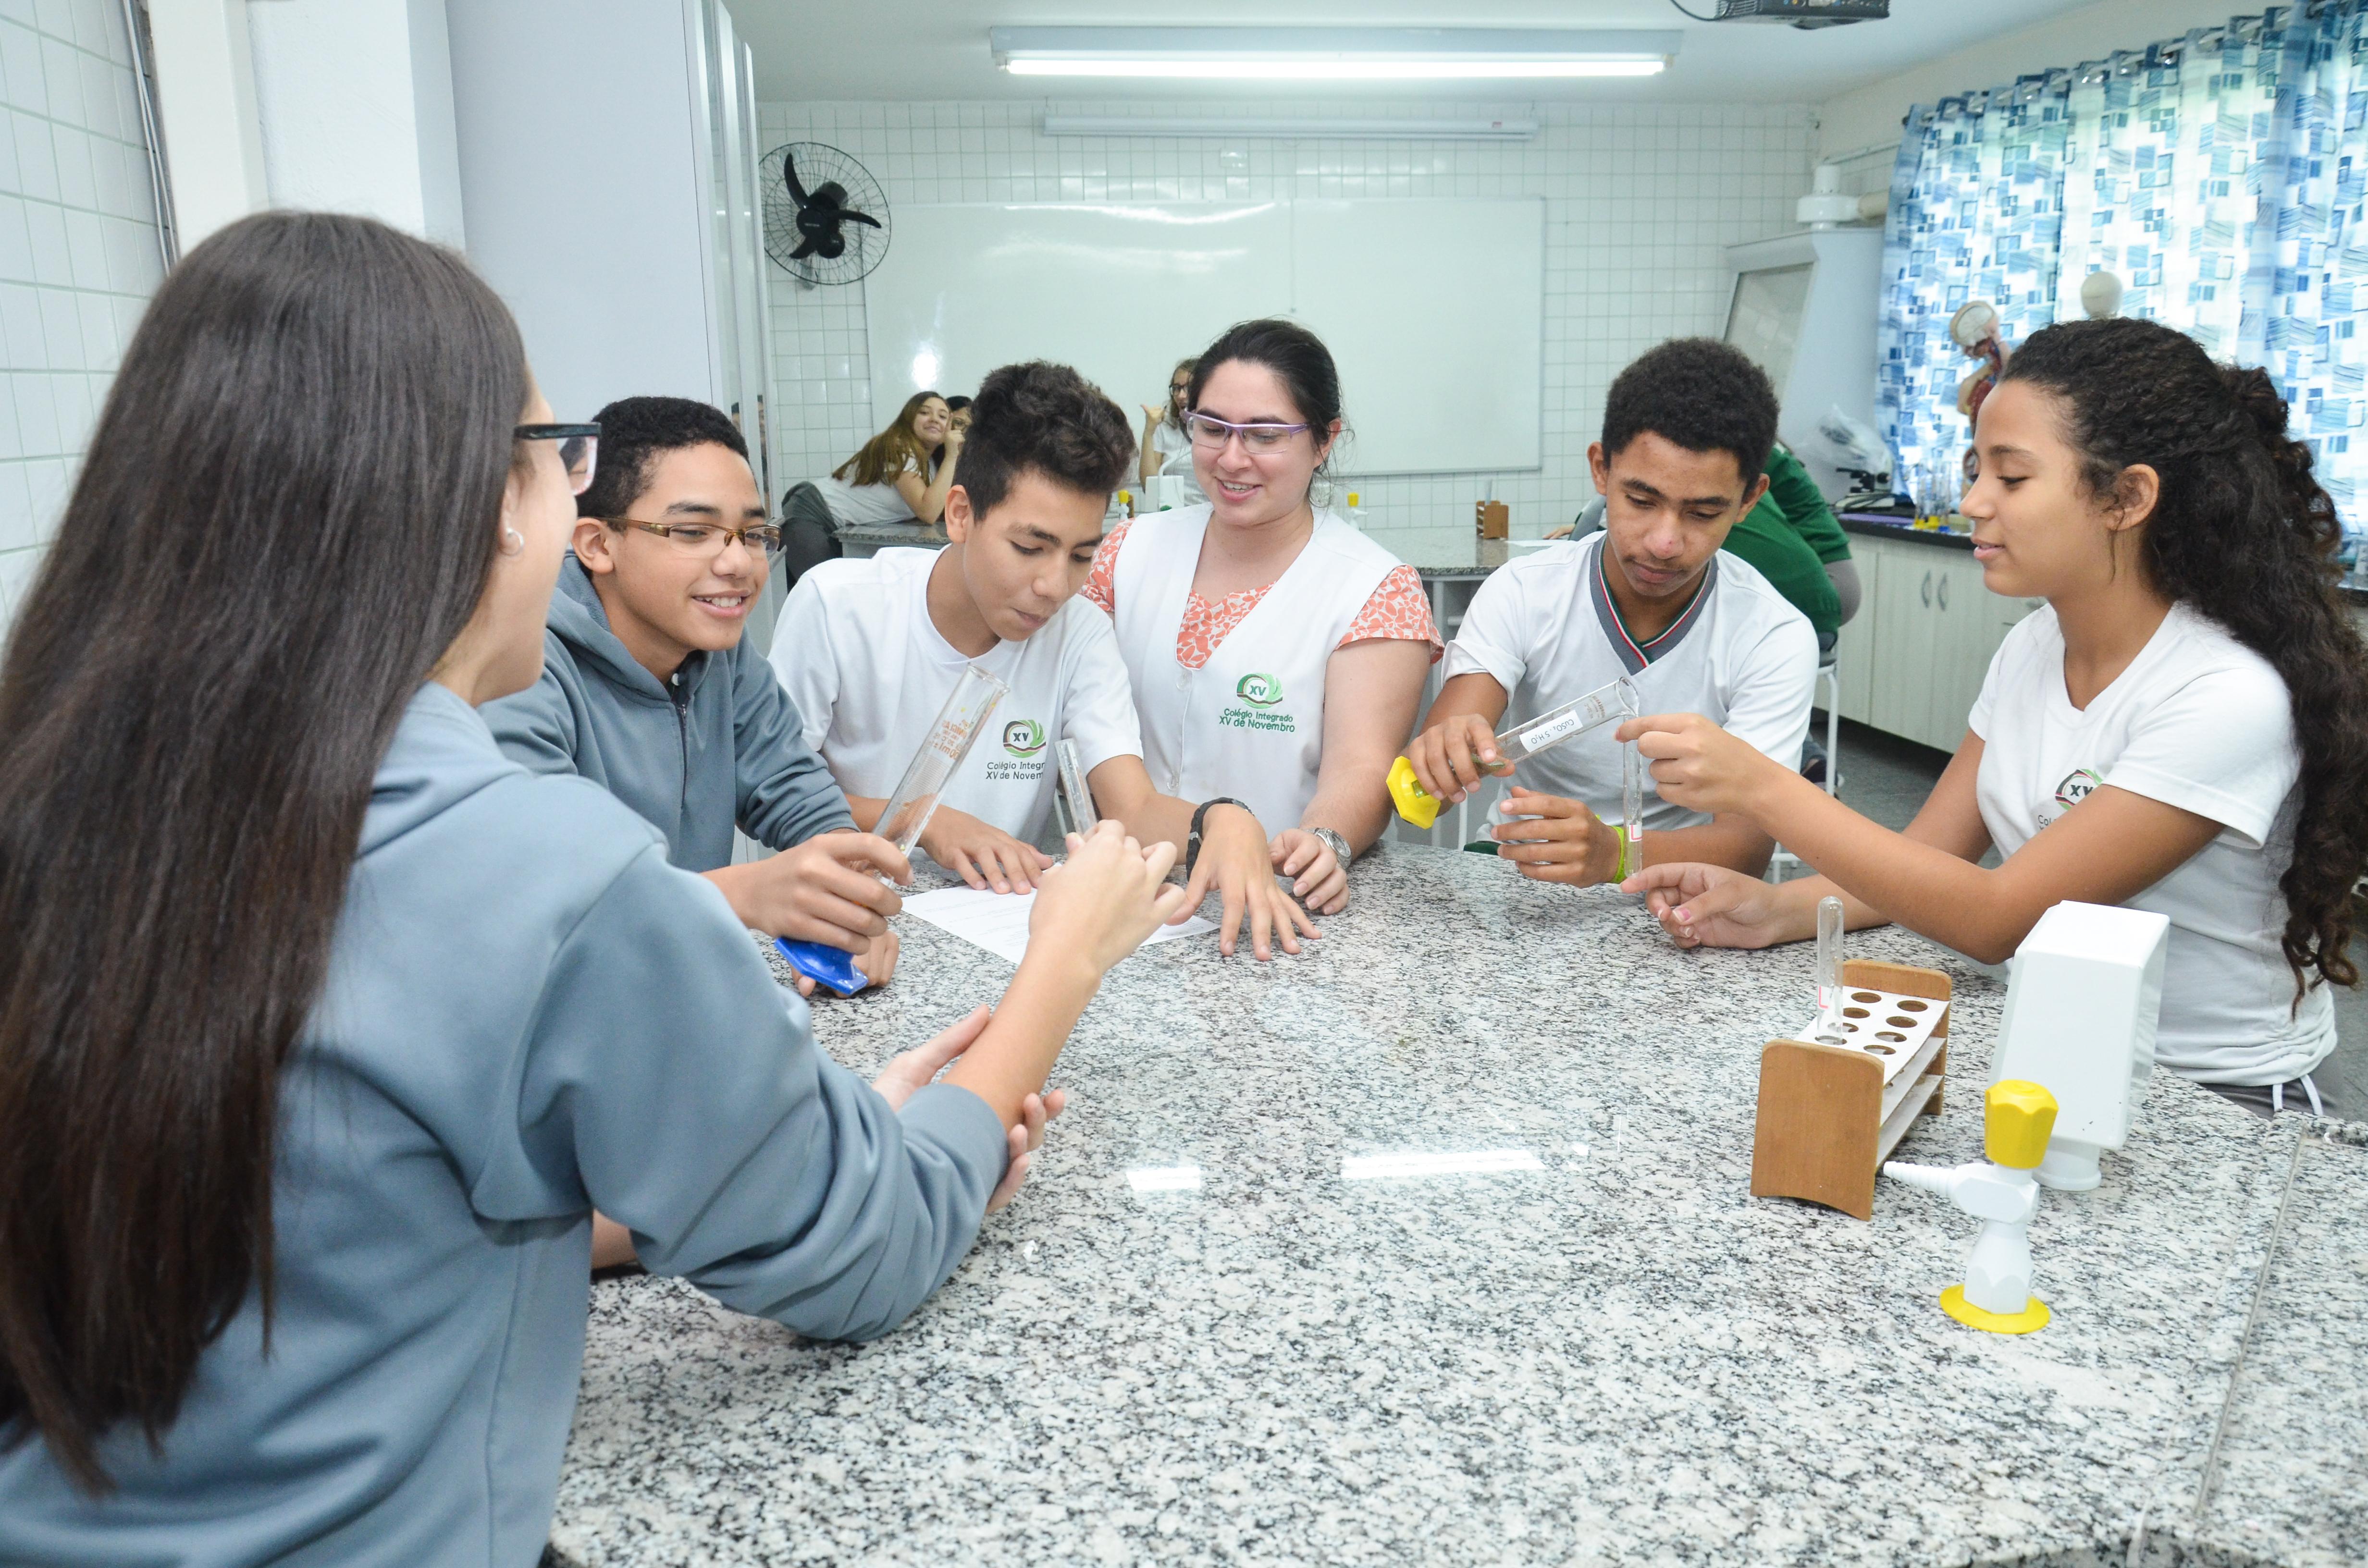 Laboratório Multidiciplinar no Colégio Integrado XV de Novembro